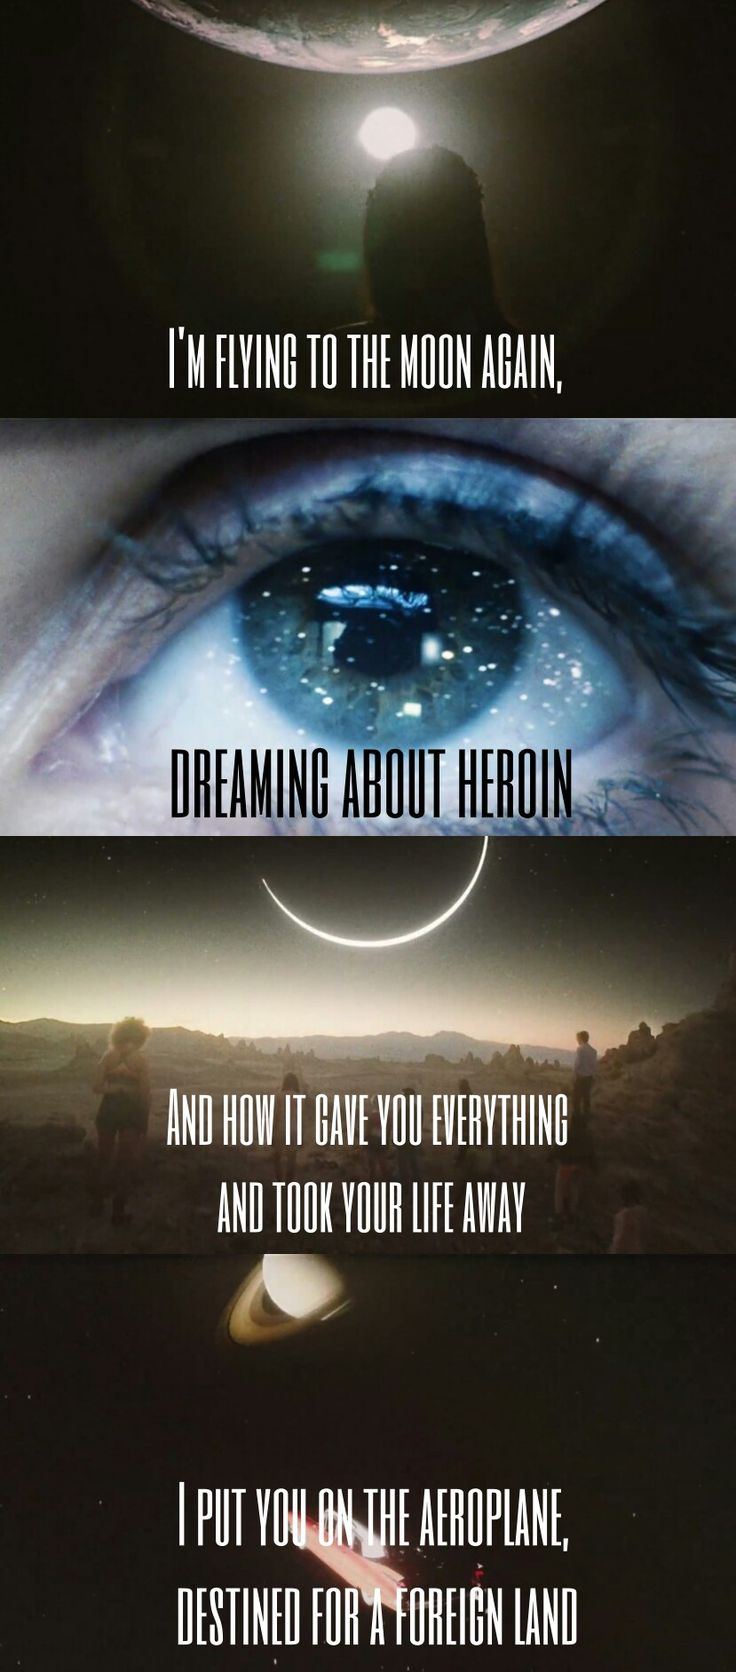 Lana Del Rey #LDR #Heroin